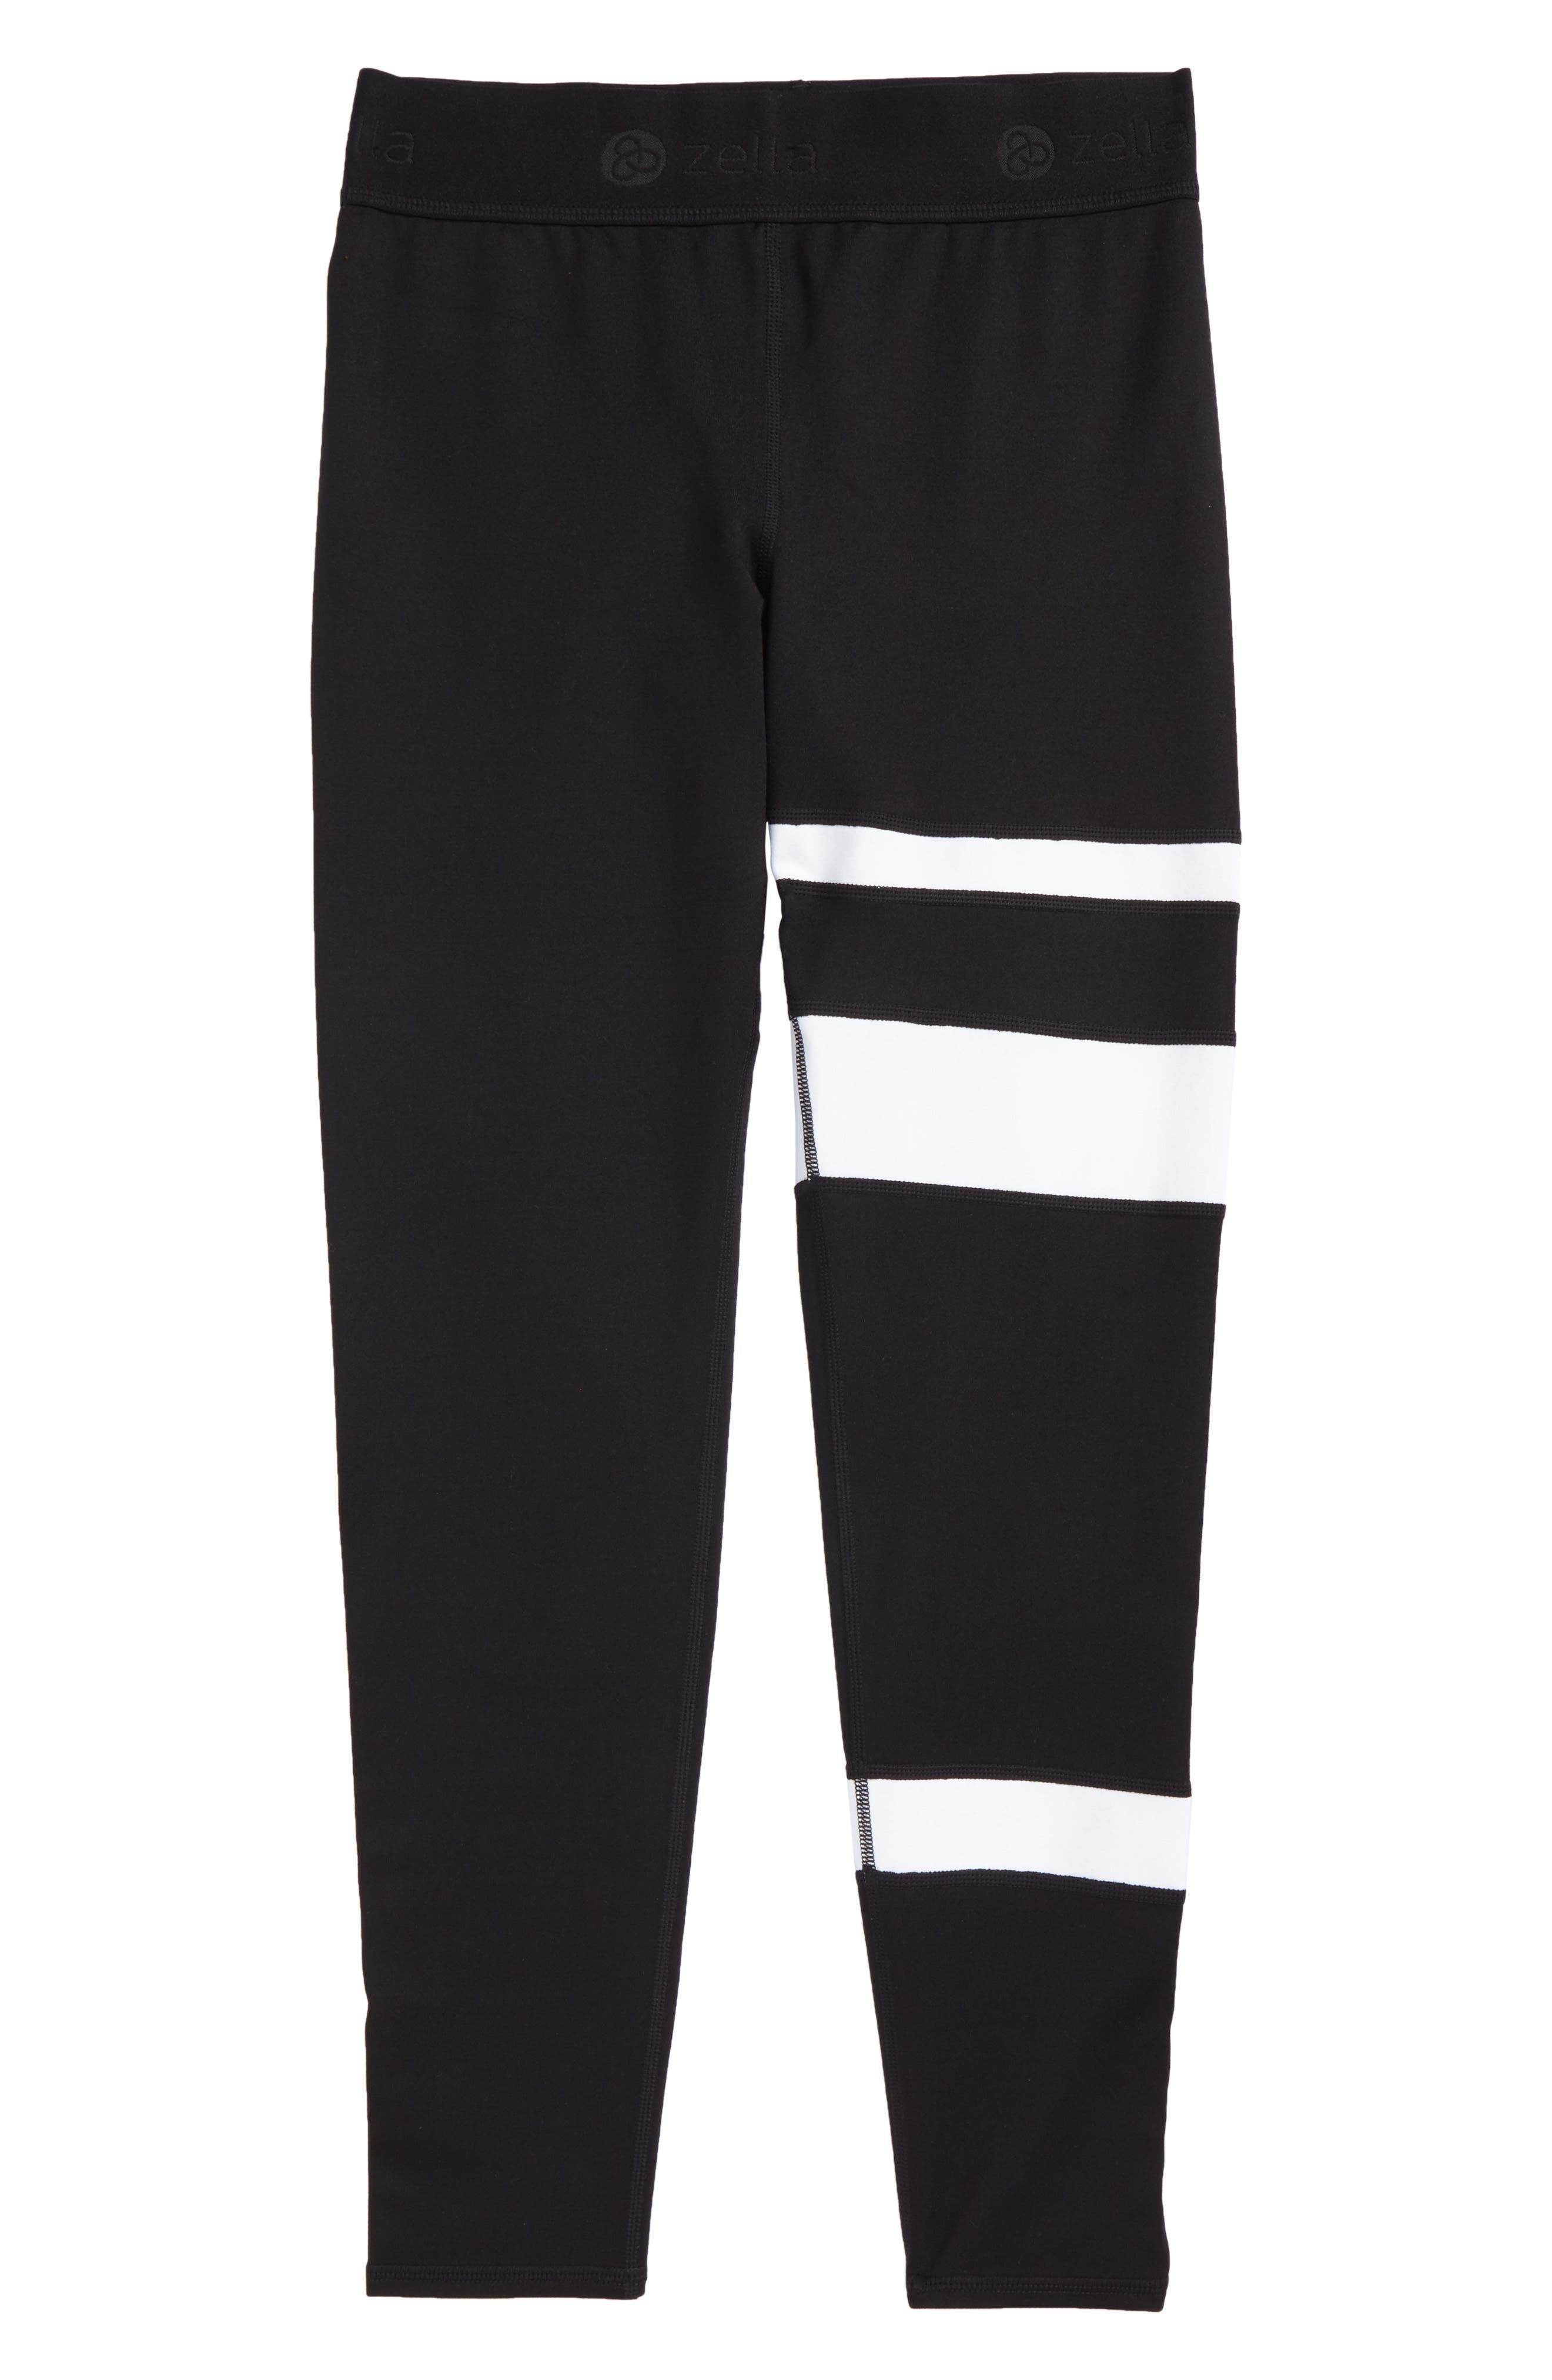 Zella Stripe Leggings,                         Main,                         color, 001